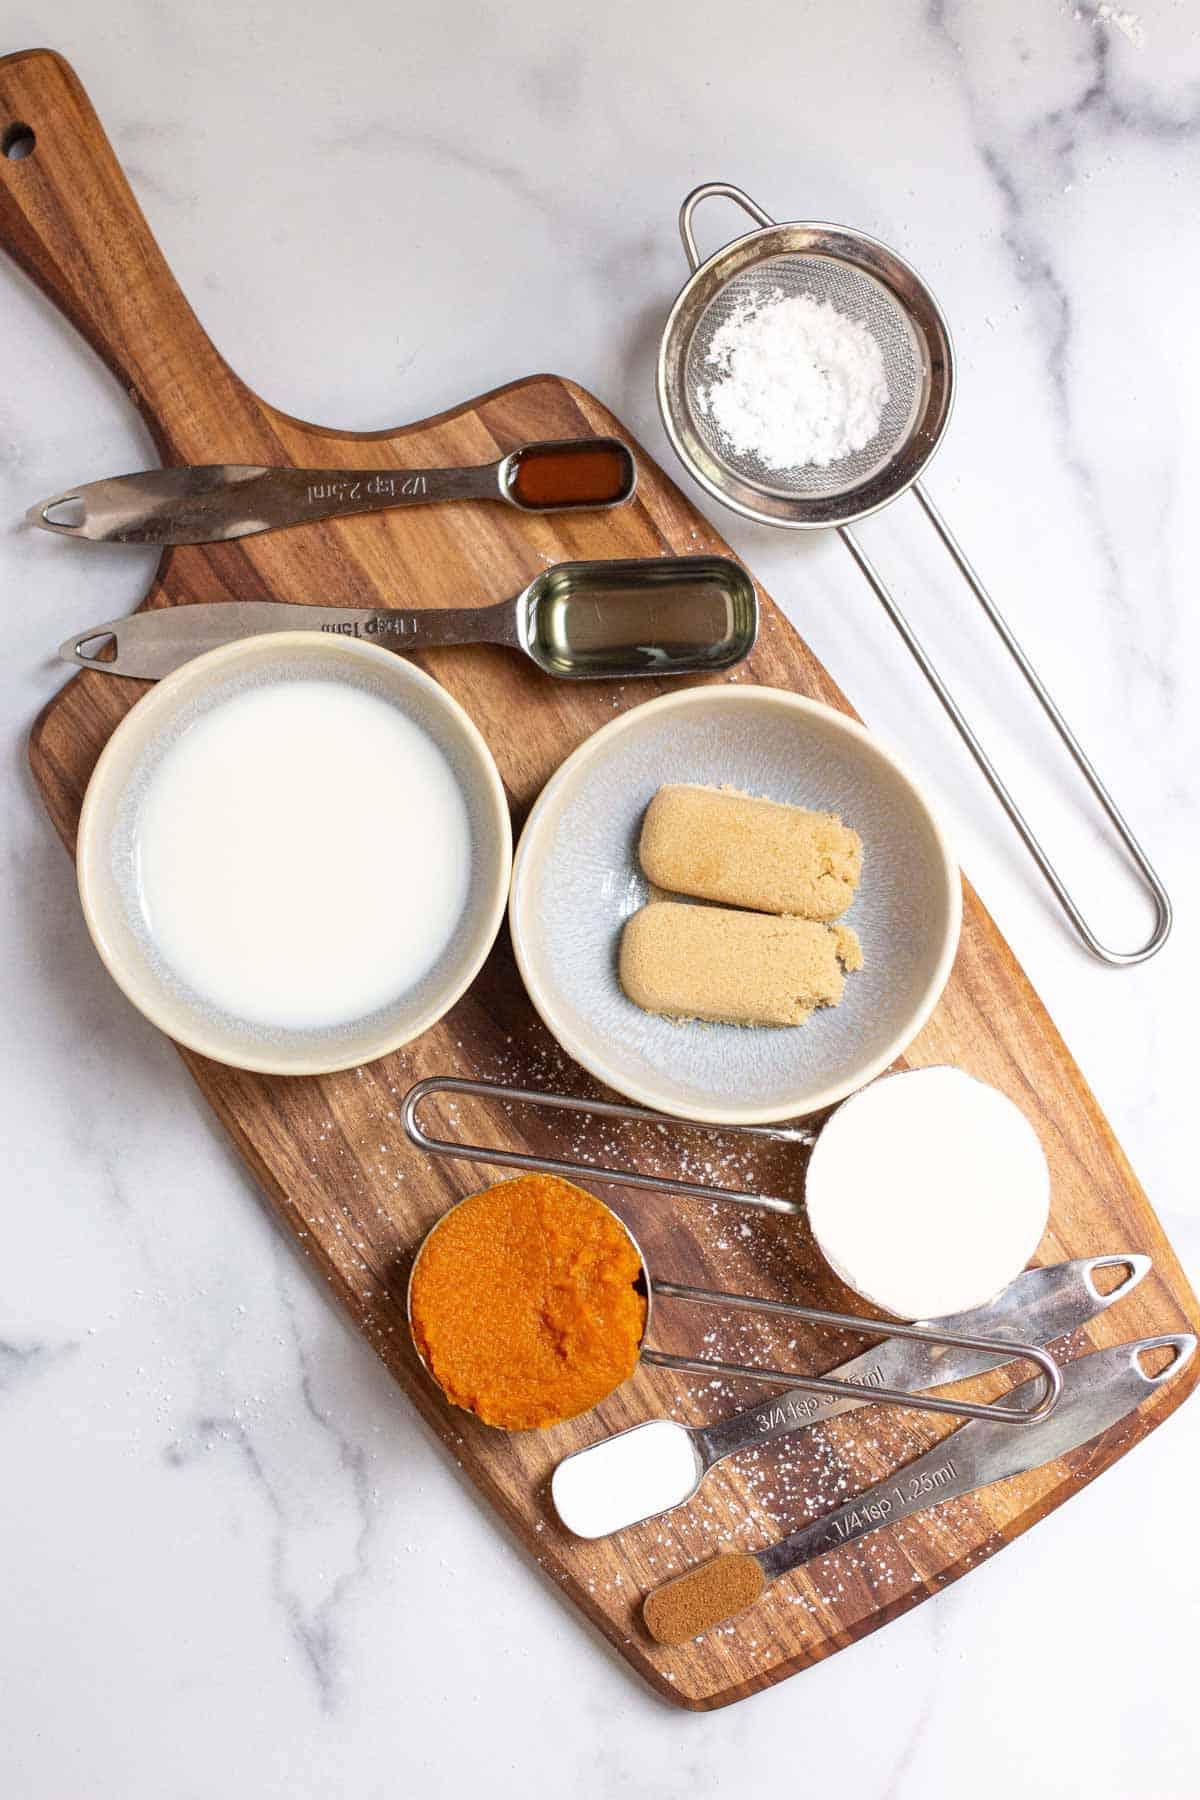 Pumpkin Mug Cake ingredients layed out: all-purpose flour, baking powder, pumpkin pie spice, salt, light brown sugar, pumpkin puree, milk, oil, pure vanilla extract, powdered sugar.